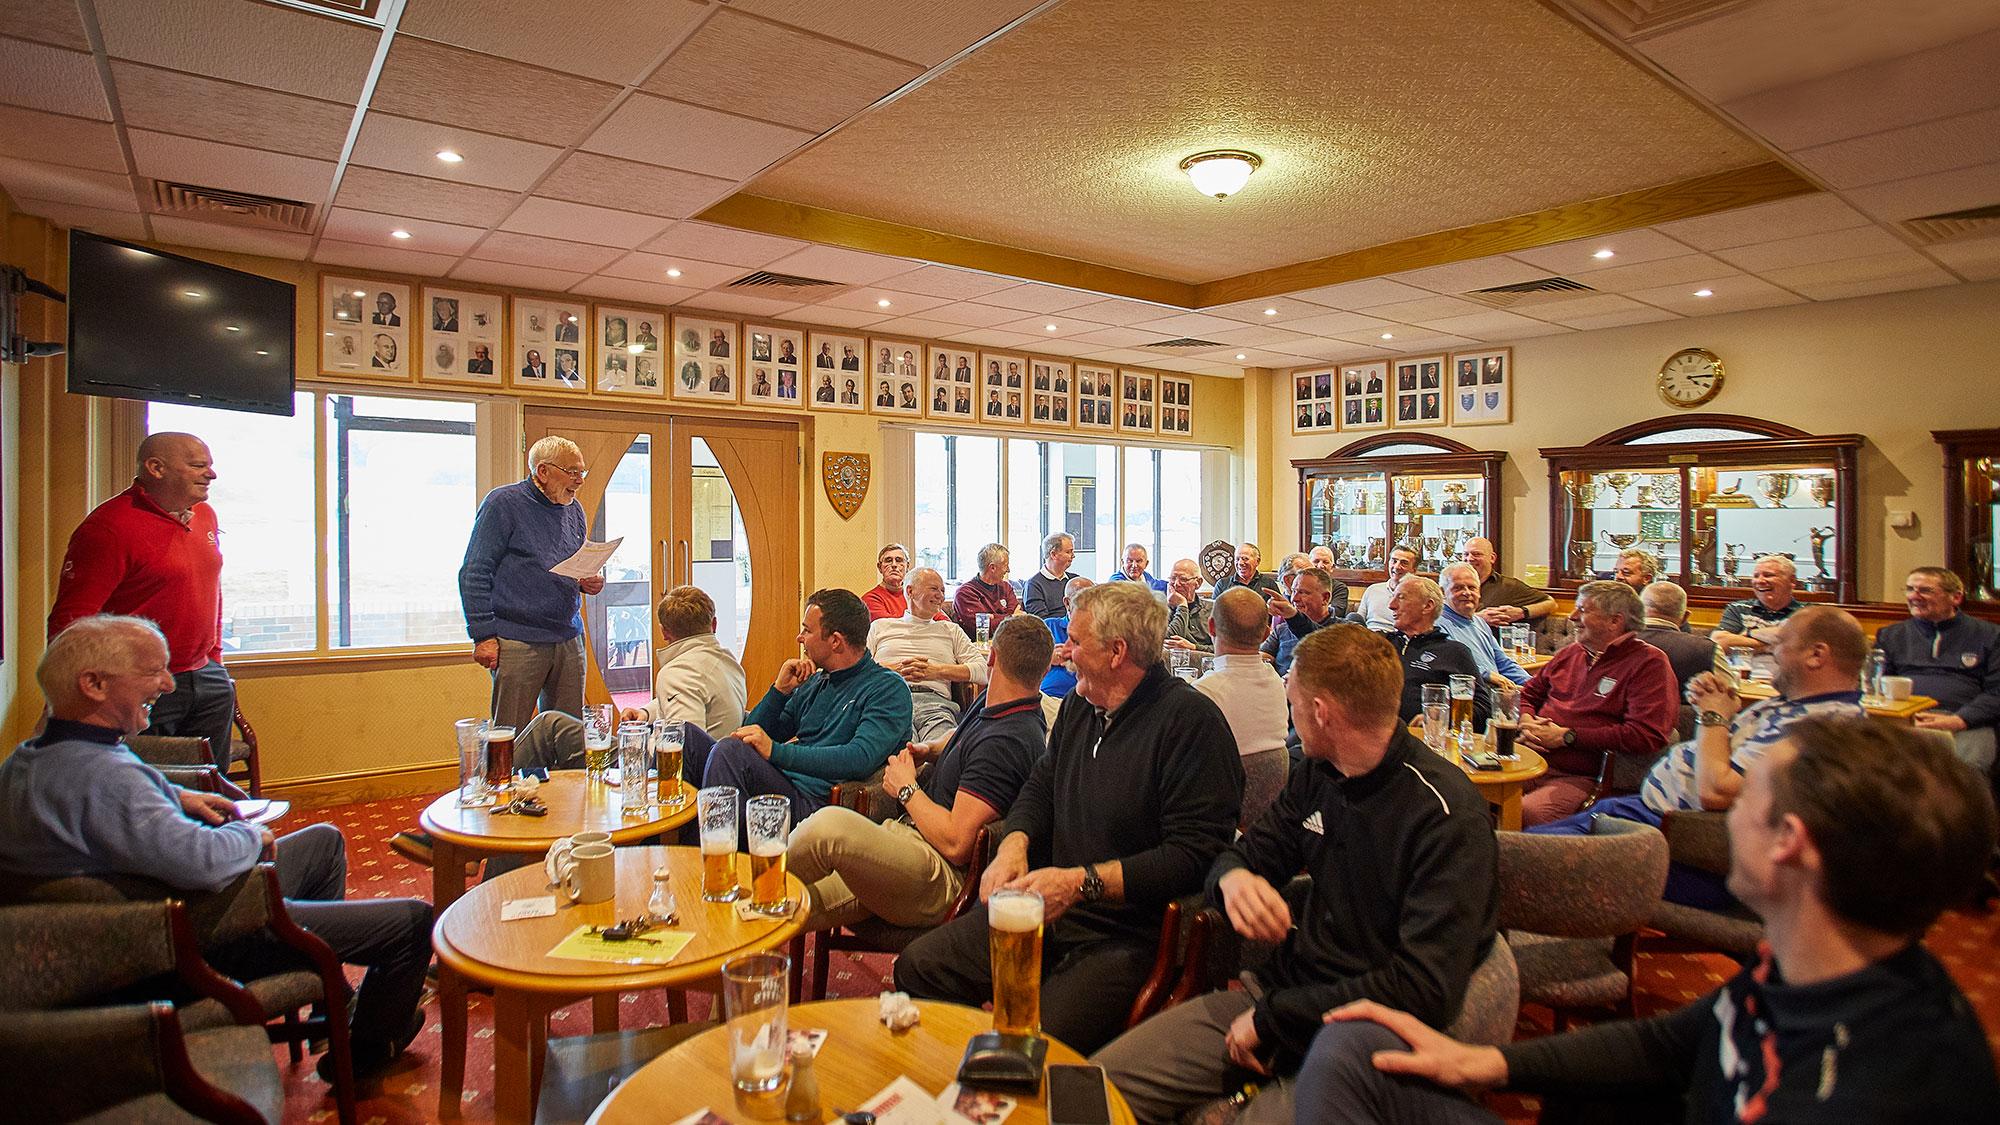 saltburn-golf-club-captains-day-02 (1).jpg